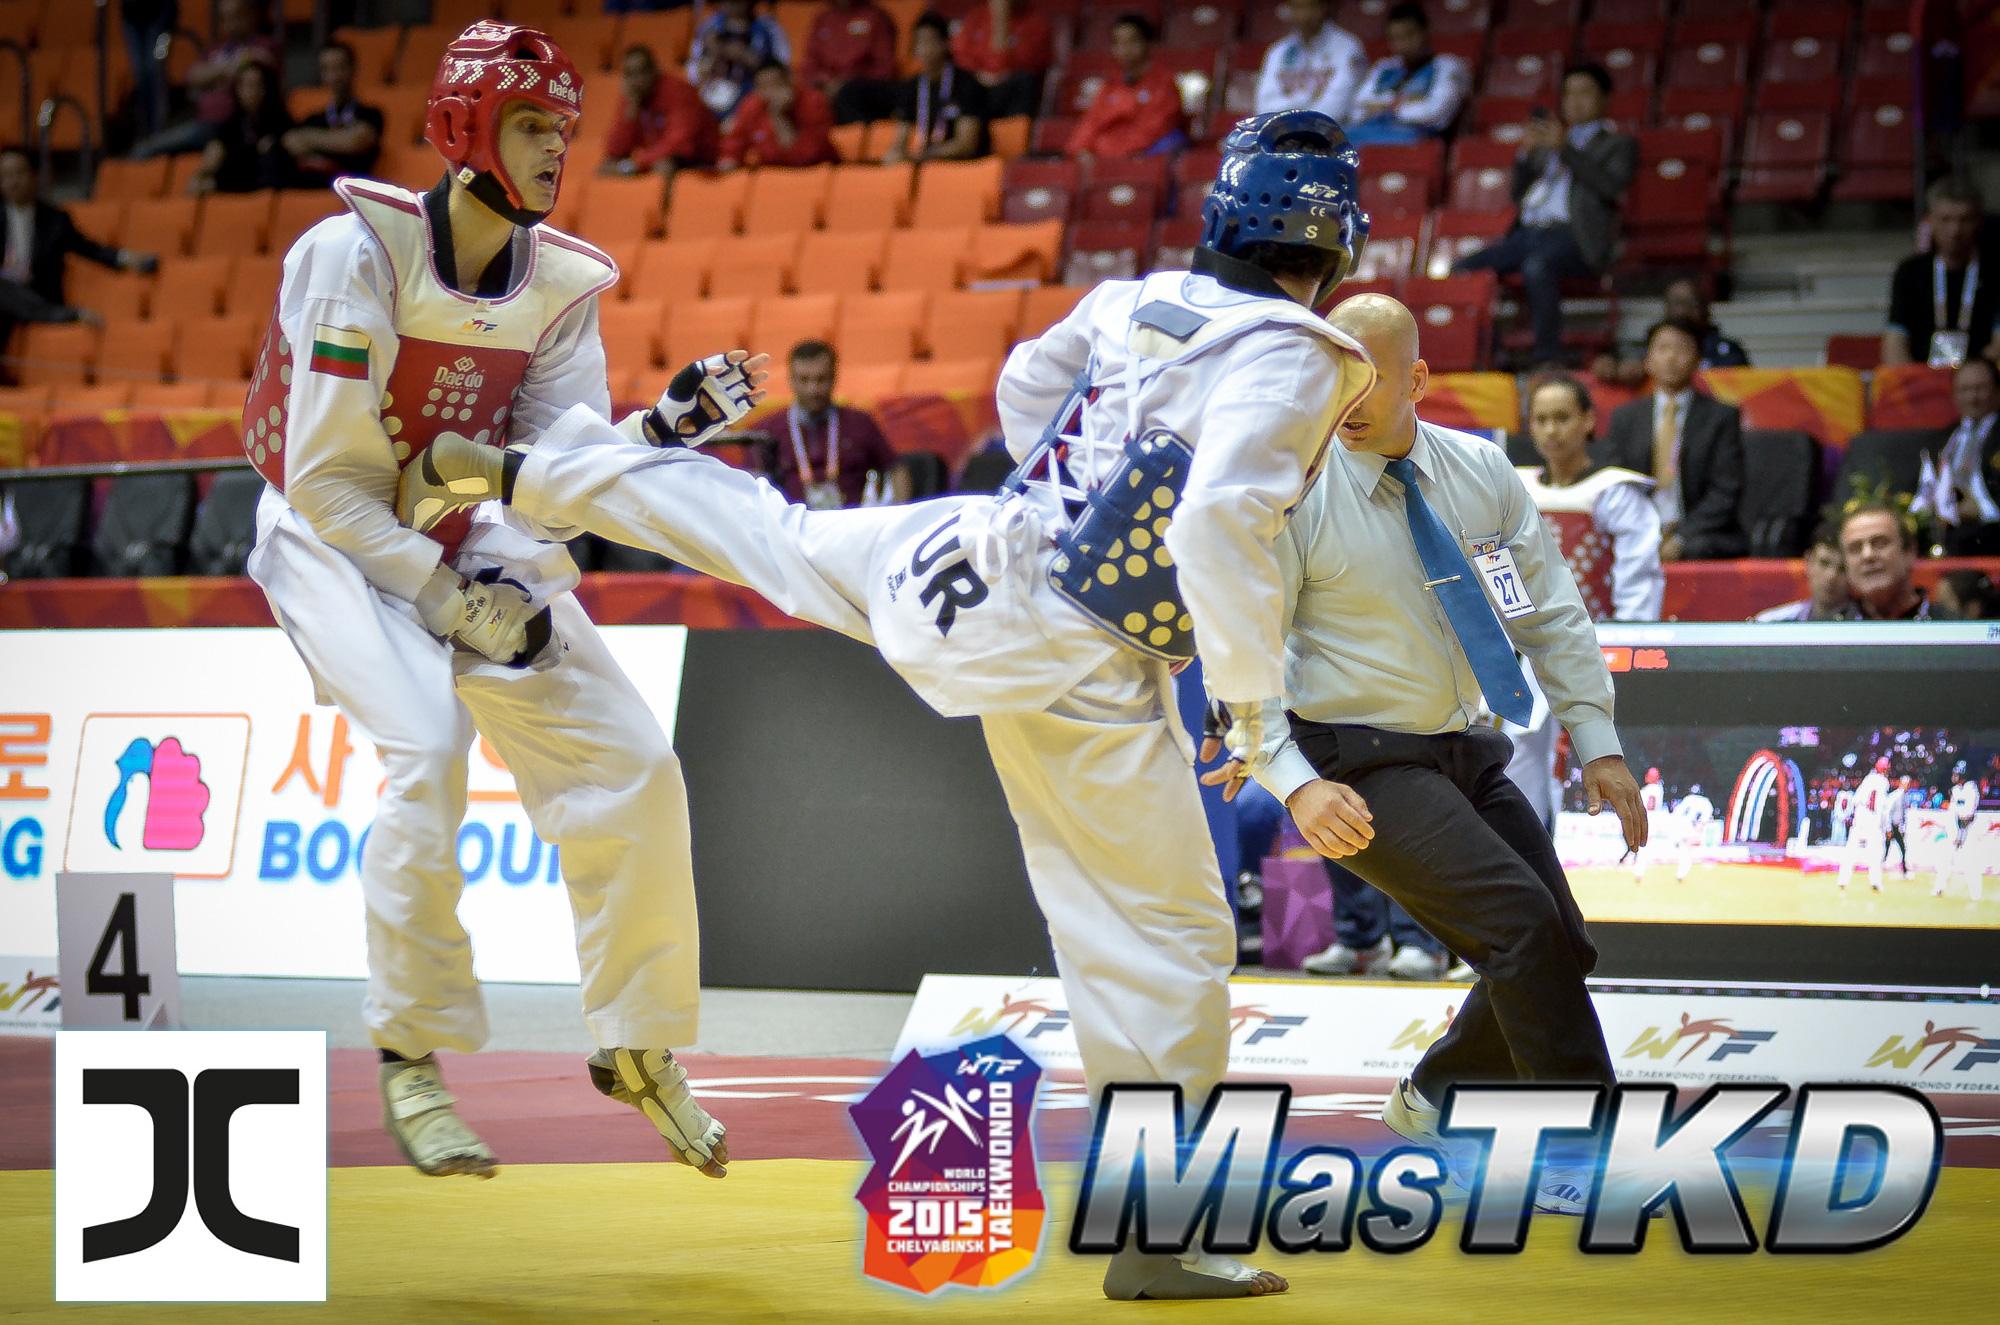 06_Seleccion_JCalicu_Mundial-Taekwondo-D3